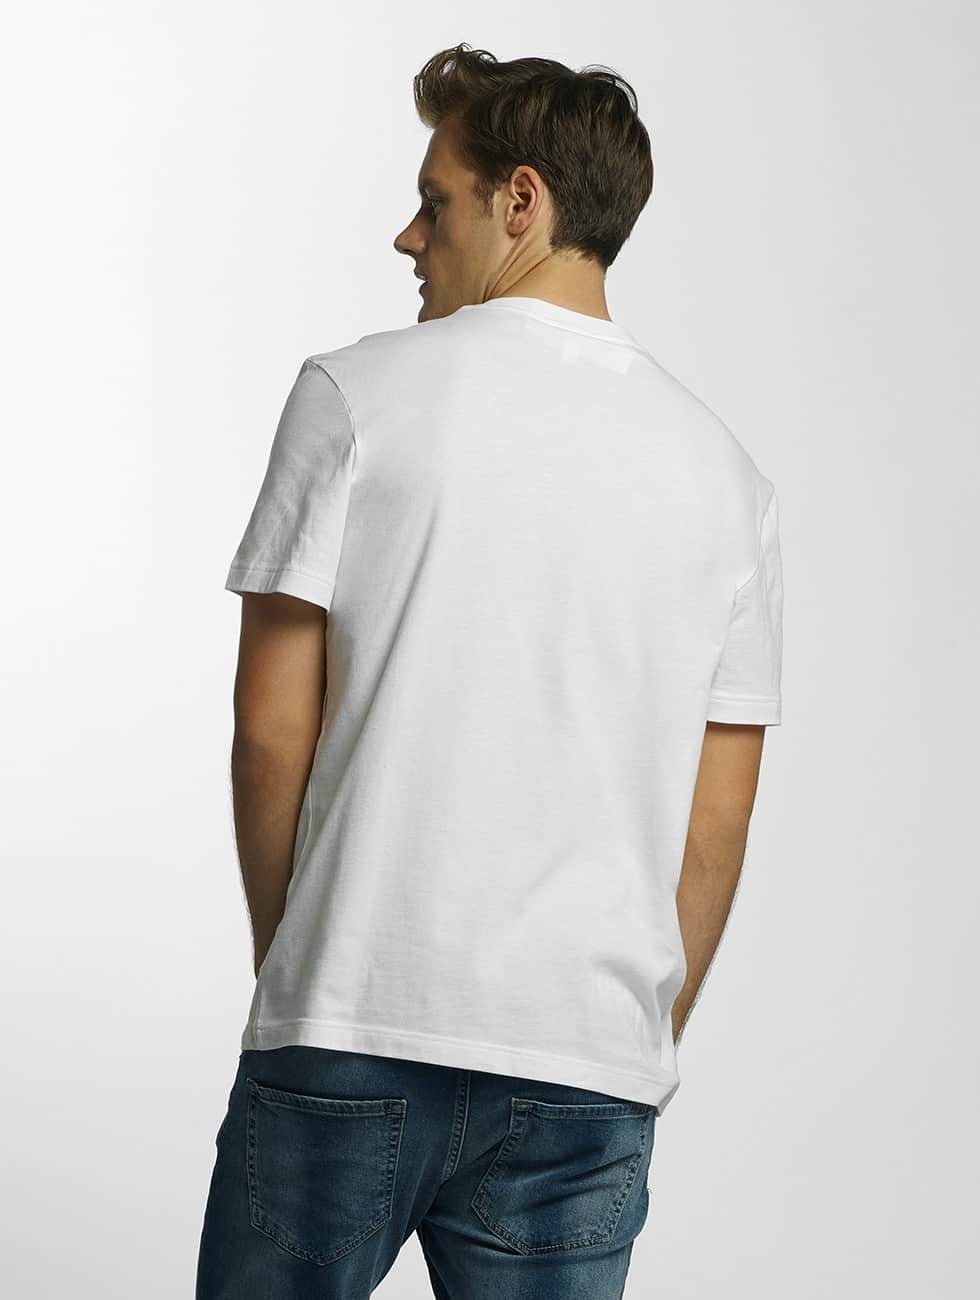 Lacoste T-skjorter Original hvit